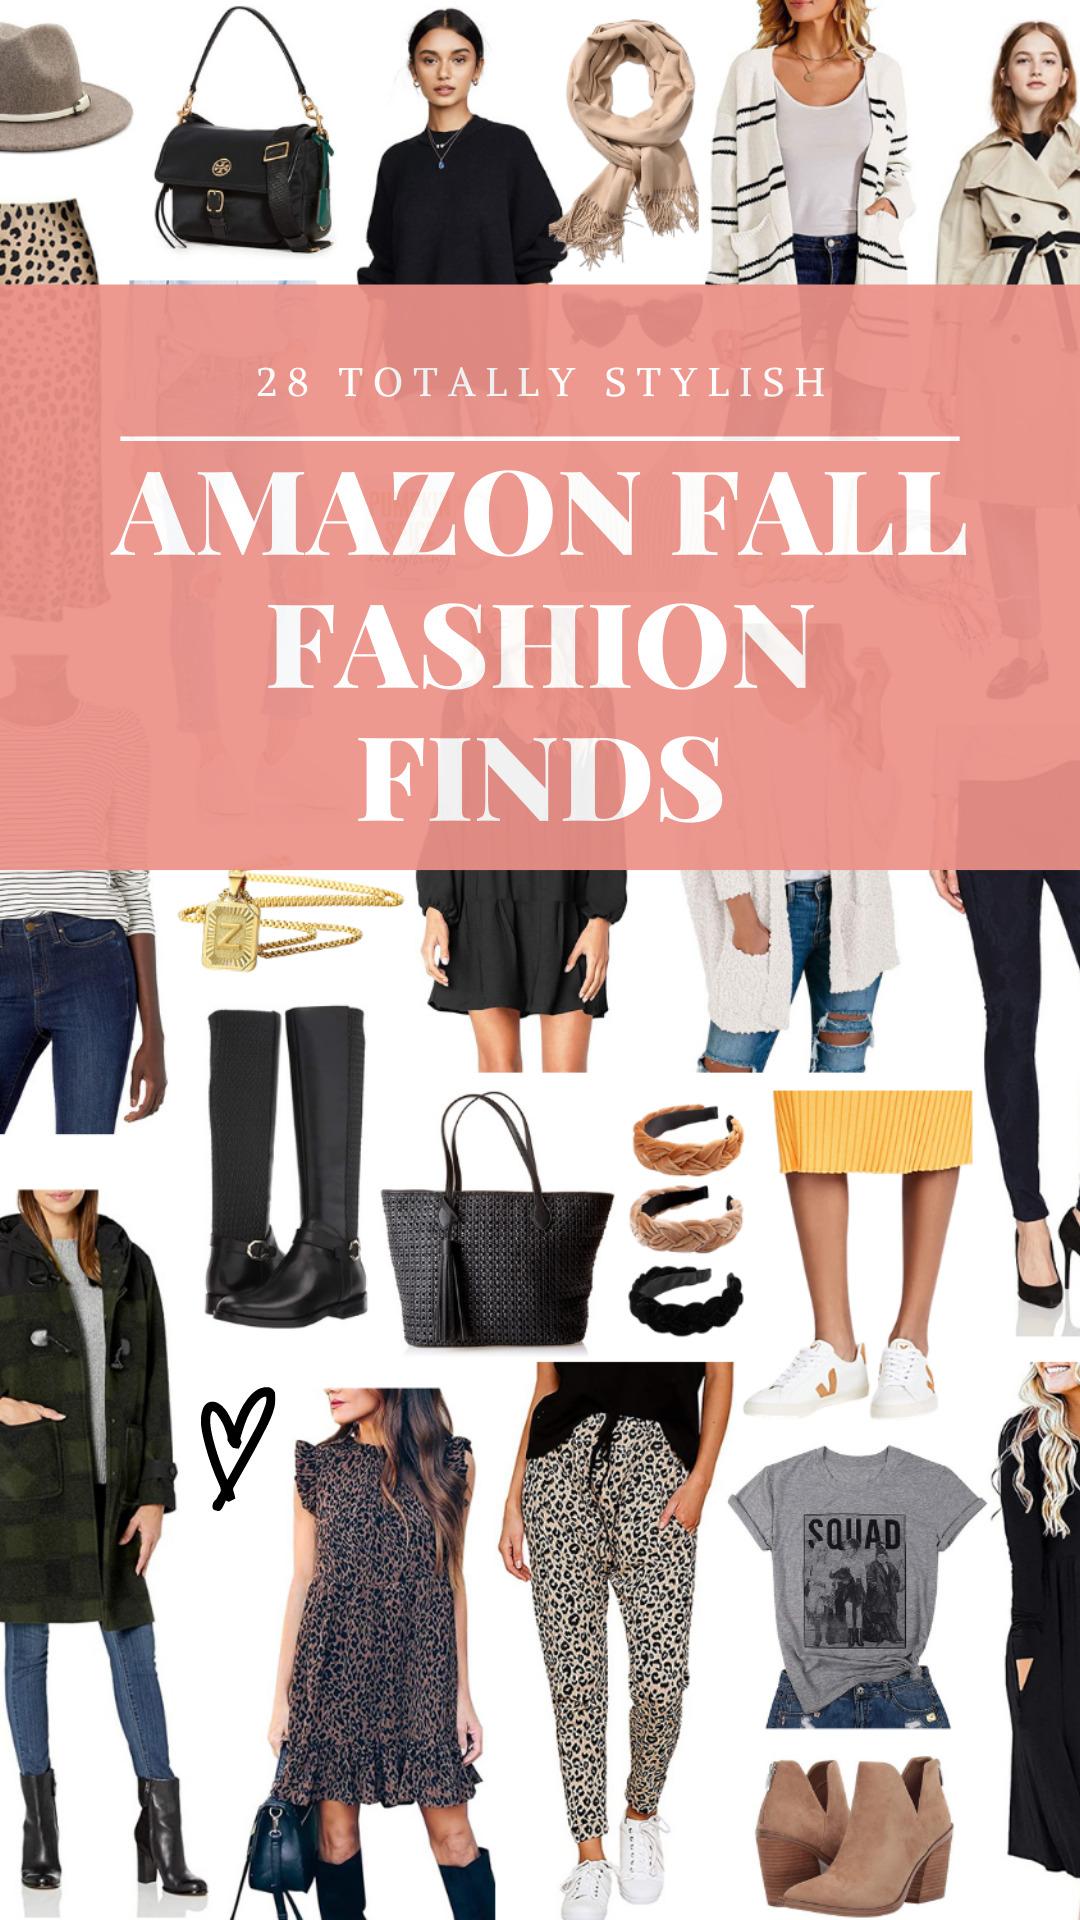 28 Stylish Amazon Fashion Finds for Fall